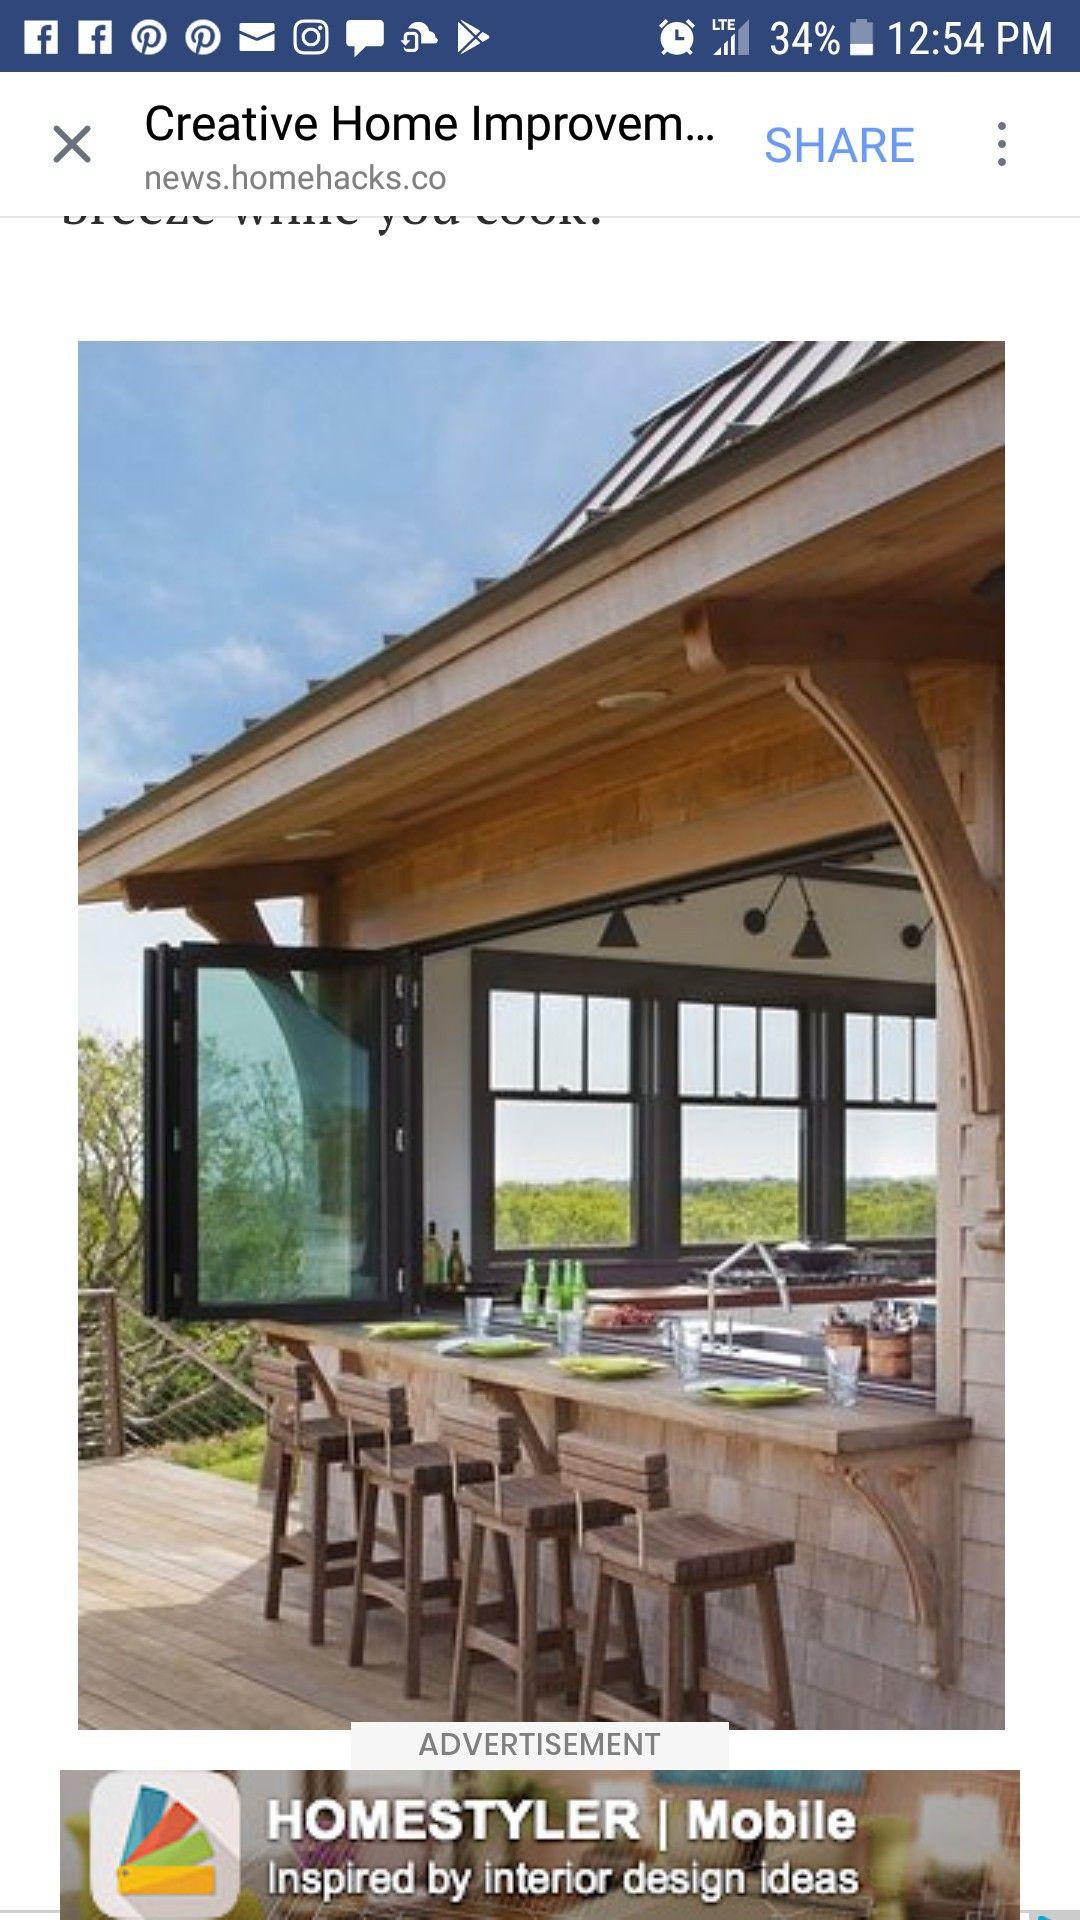 Pin by annette montford on porch u patio design ideas in